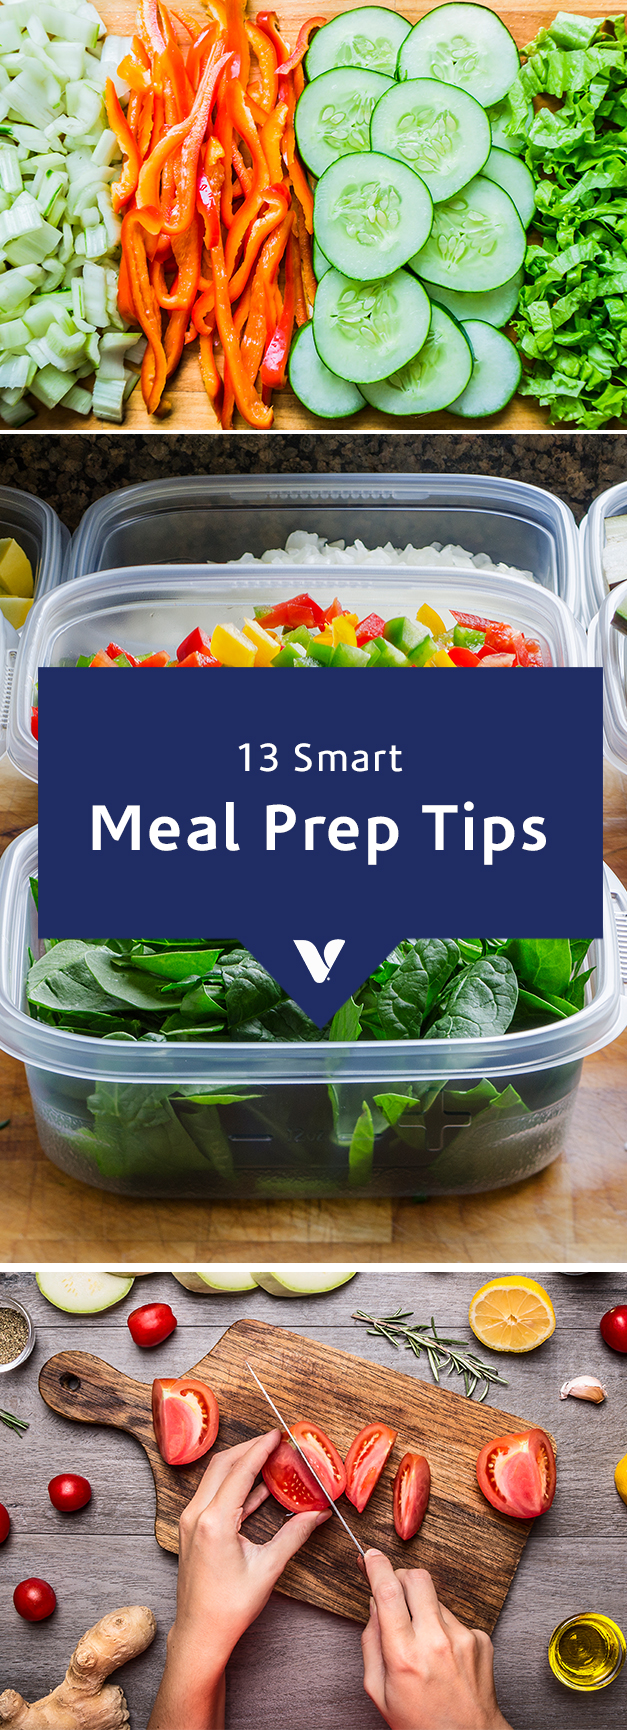 meal-prep-tips